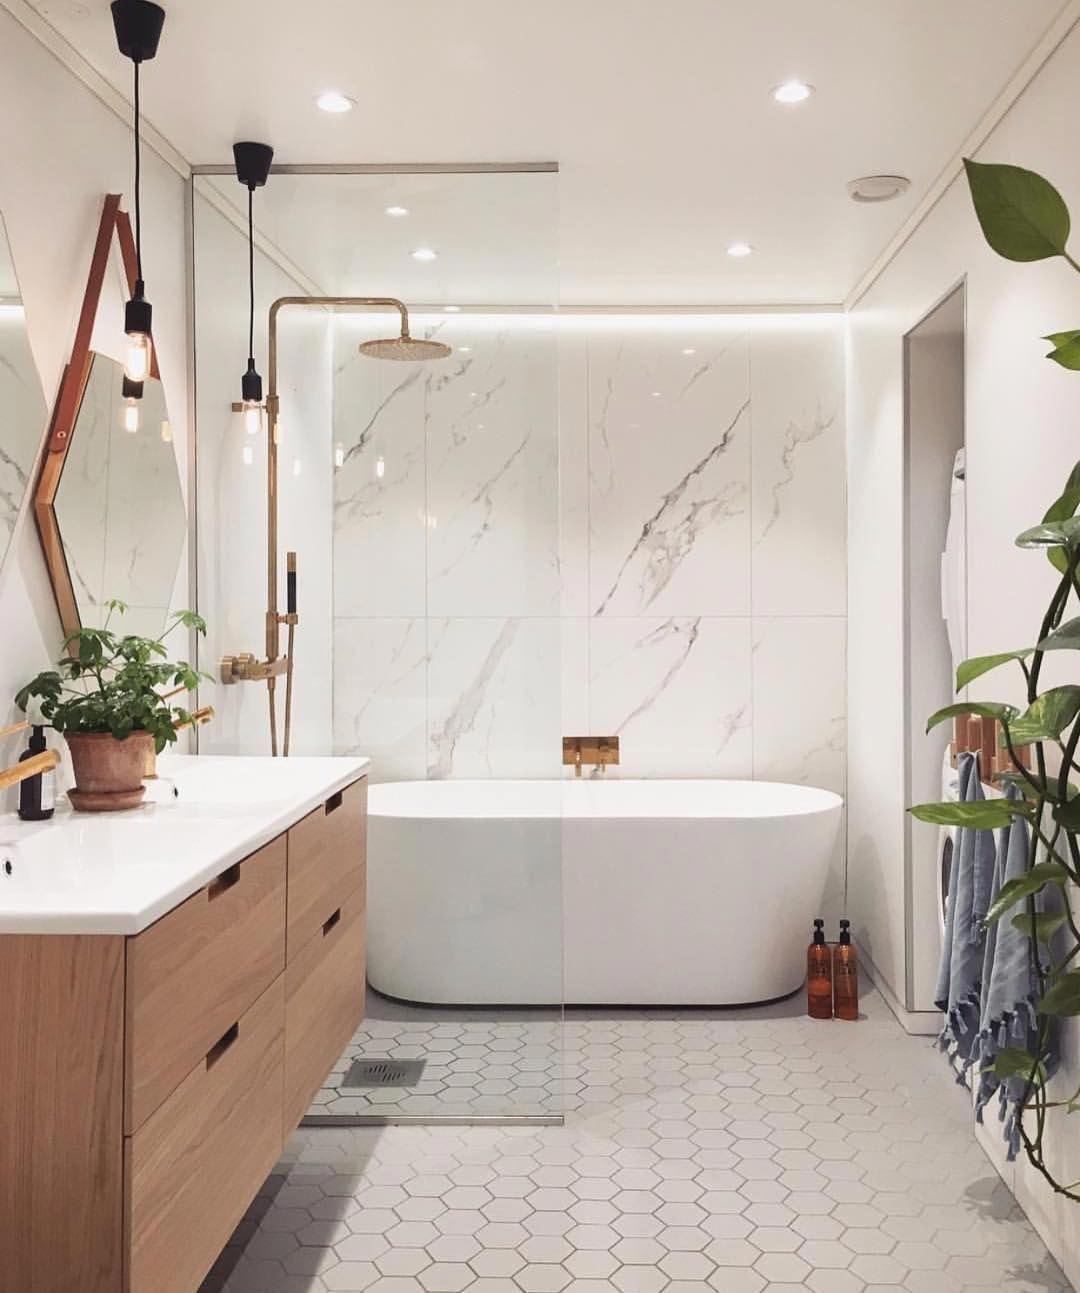 Southwestern Decor Rose Gold Bathroom Decor Shop Bathroom